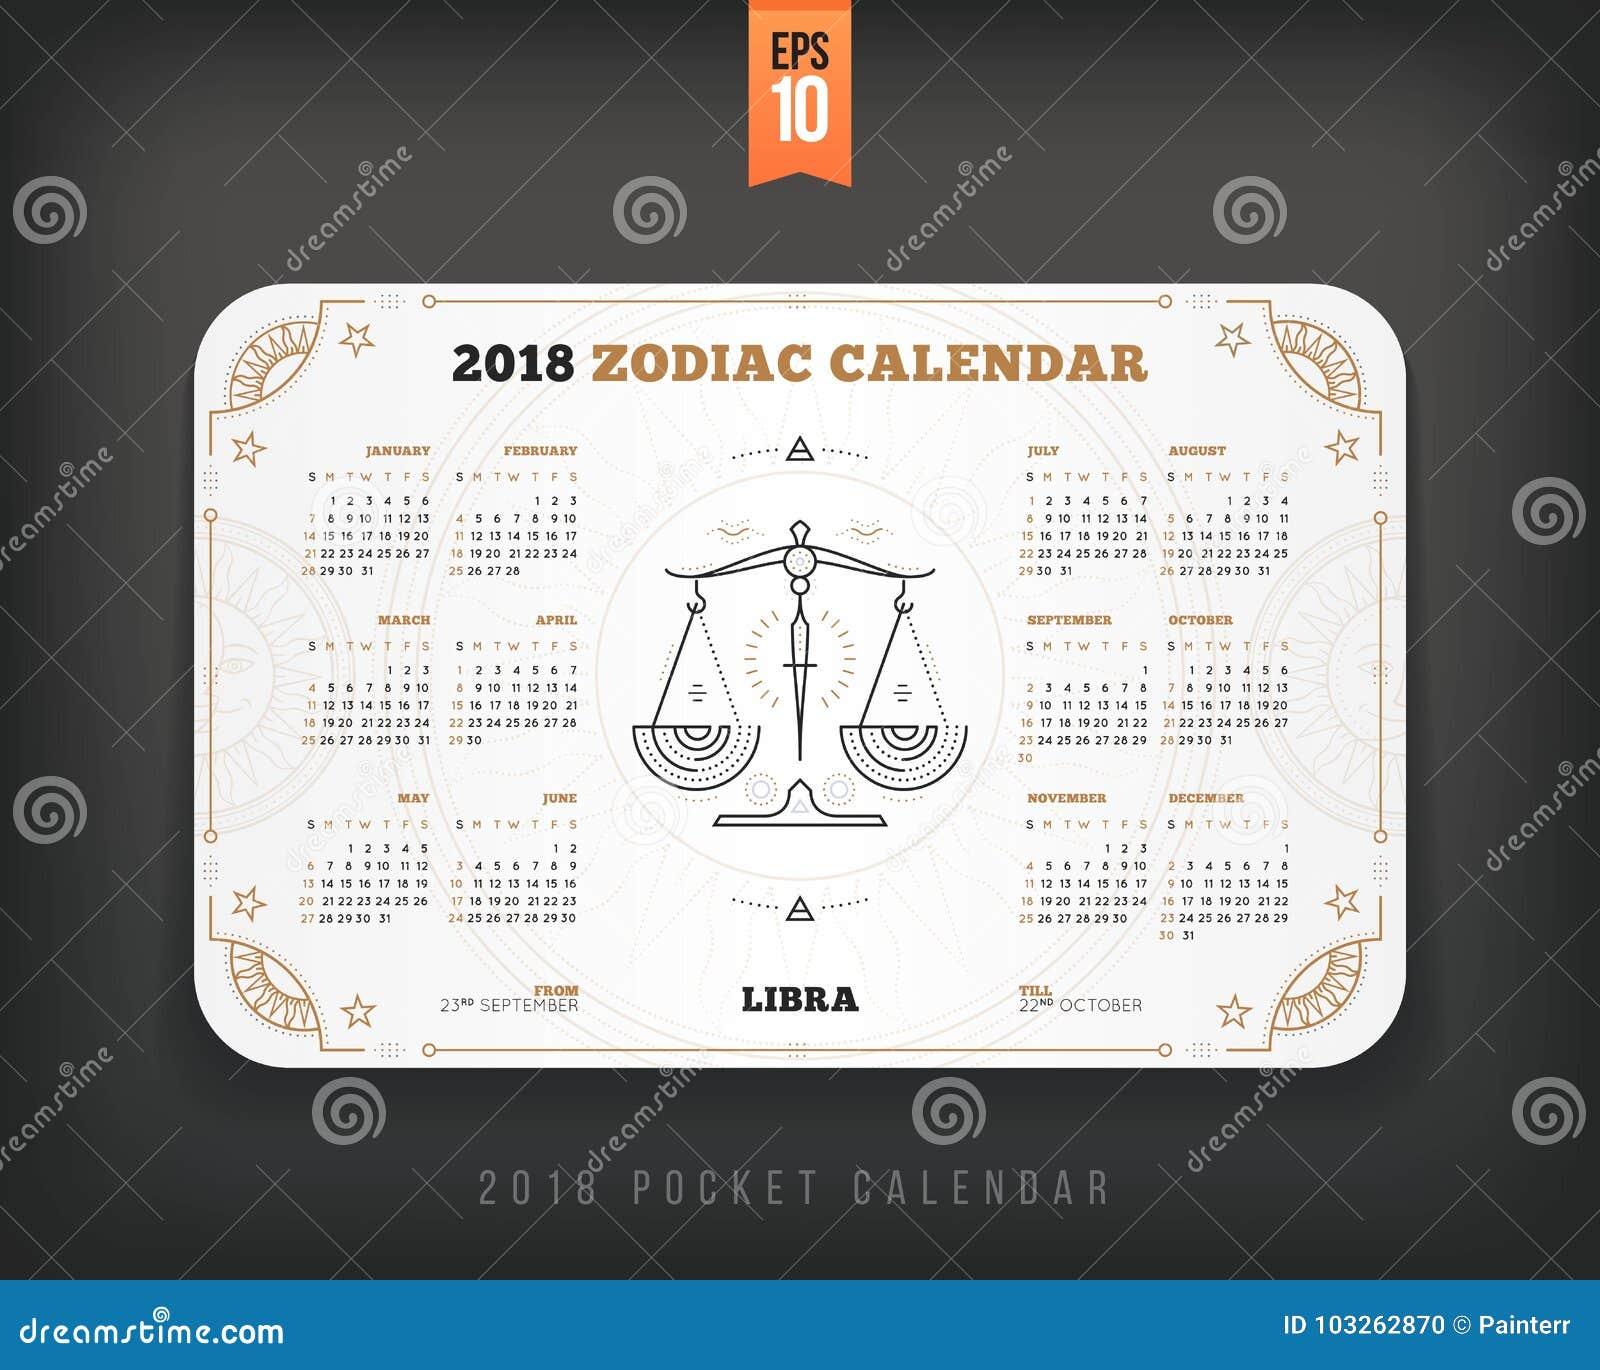 Libra 2018 Year Zodiac Calendar Pocket Size Horizontal